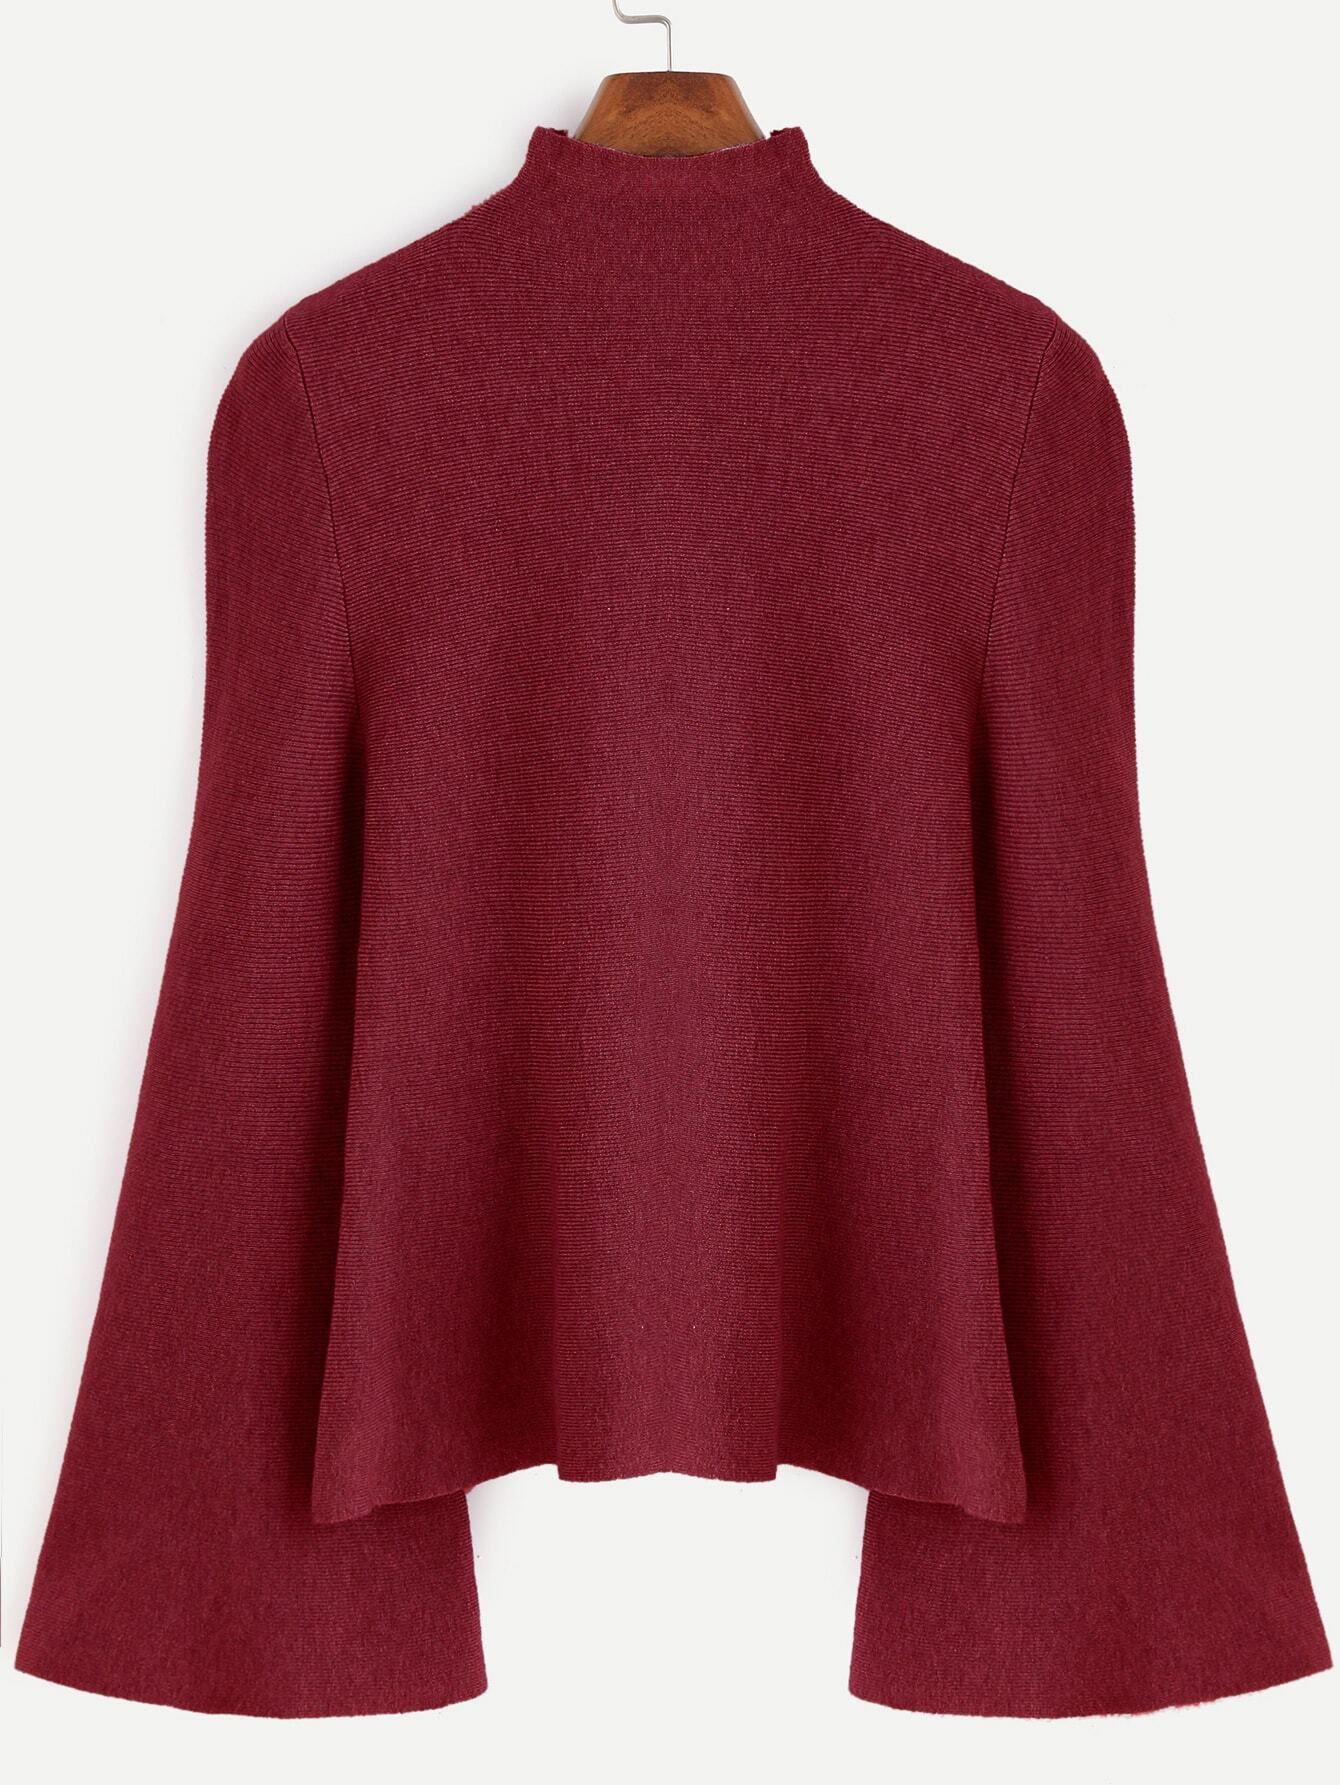 sweater161121002_2